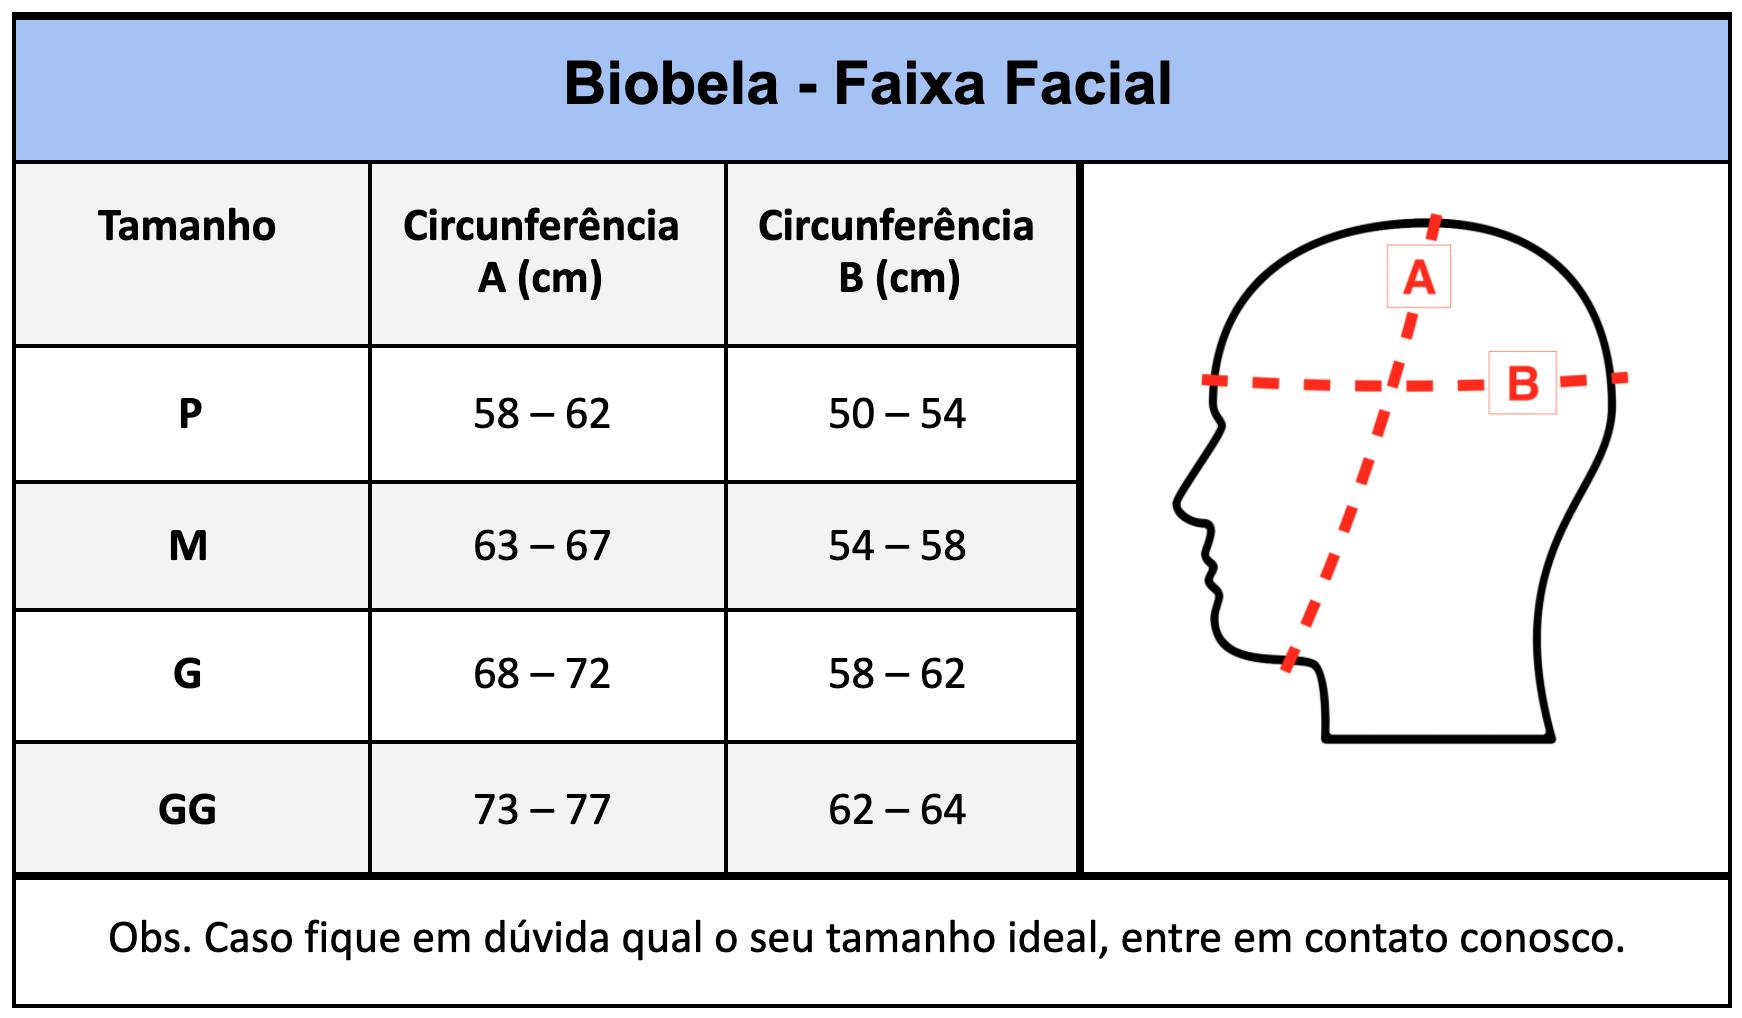 Faixa cirúrgica compressiva mentoneira Biobela 1637 PR mentoplastia mini lifting lipo na papada queixo harmonia facial  - Cinta se Nova